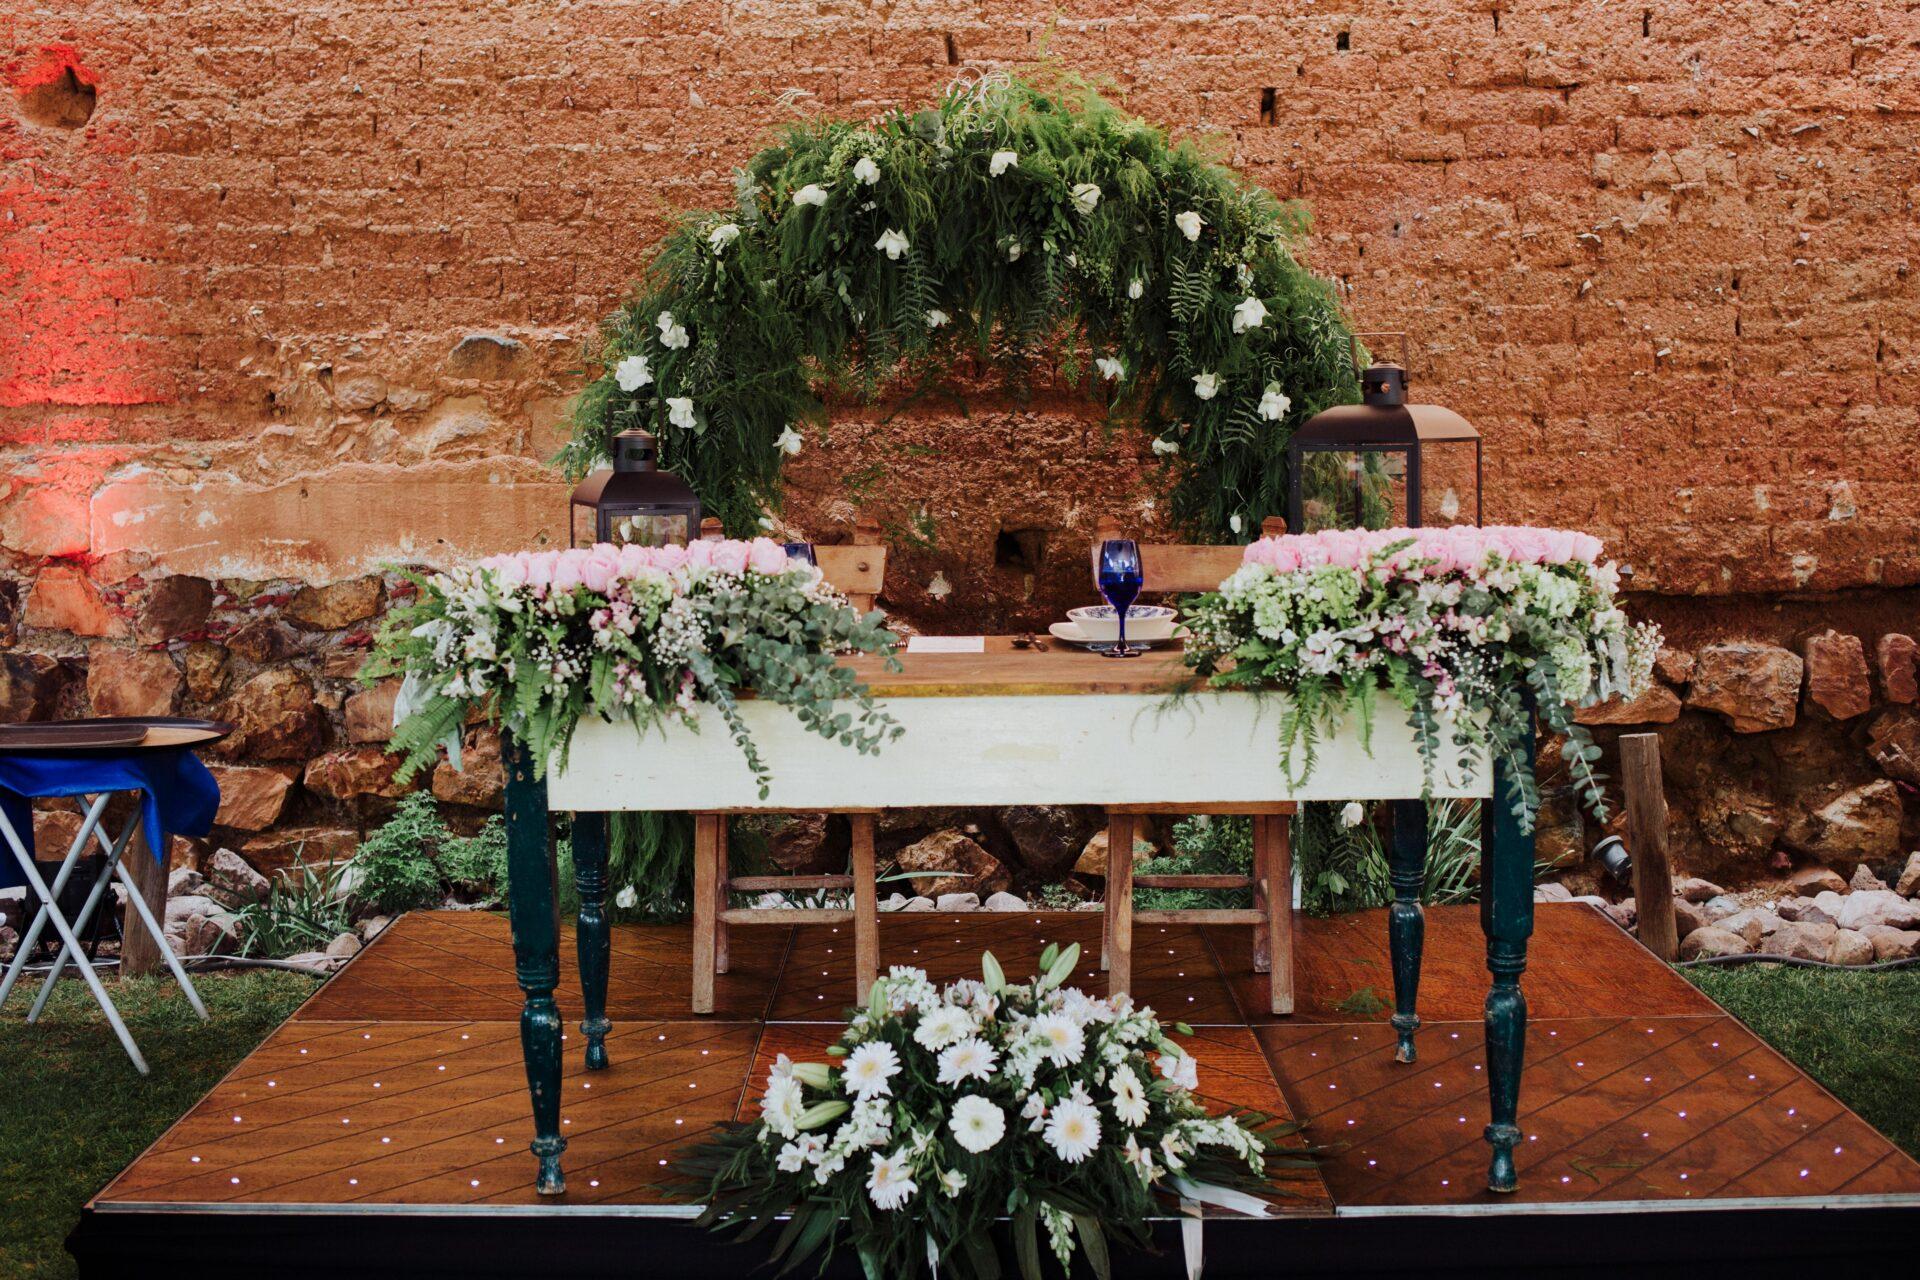 javier_noriega_fotografo_bodas_exhacienda_las_mercedes_zacatecas_wedding_photographer8a